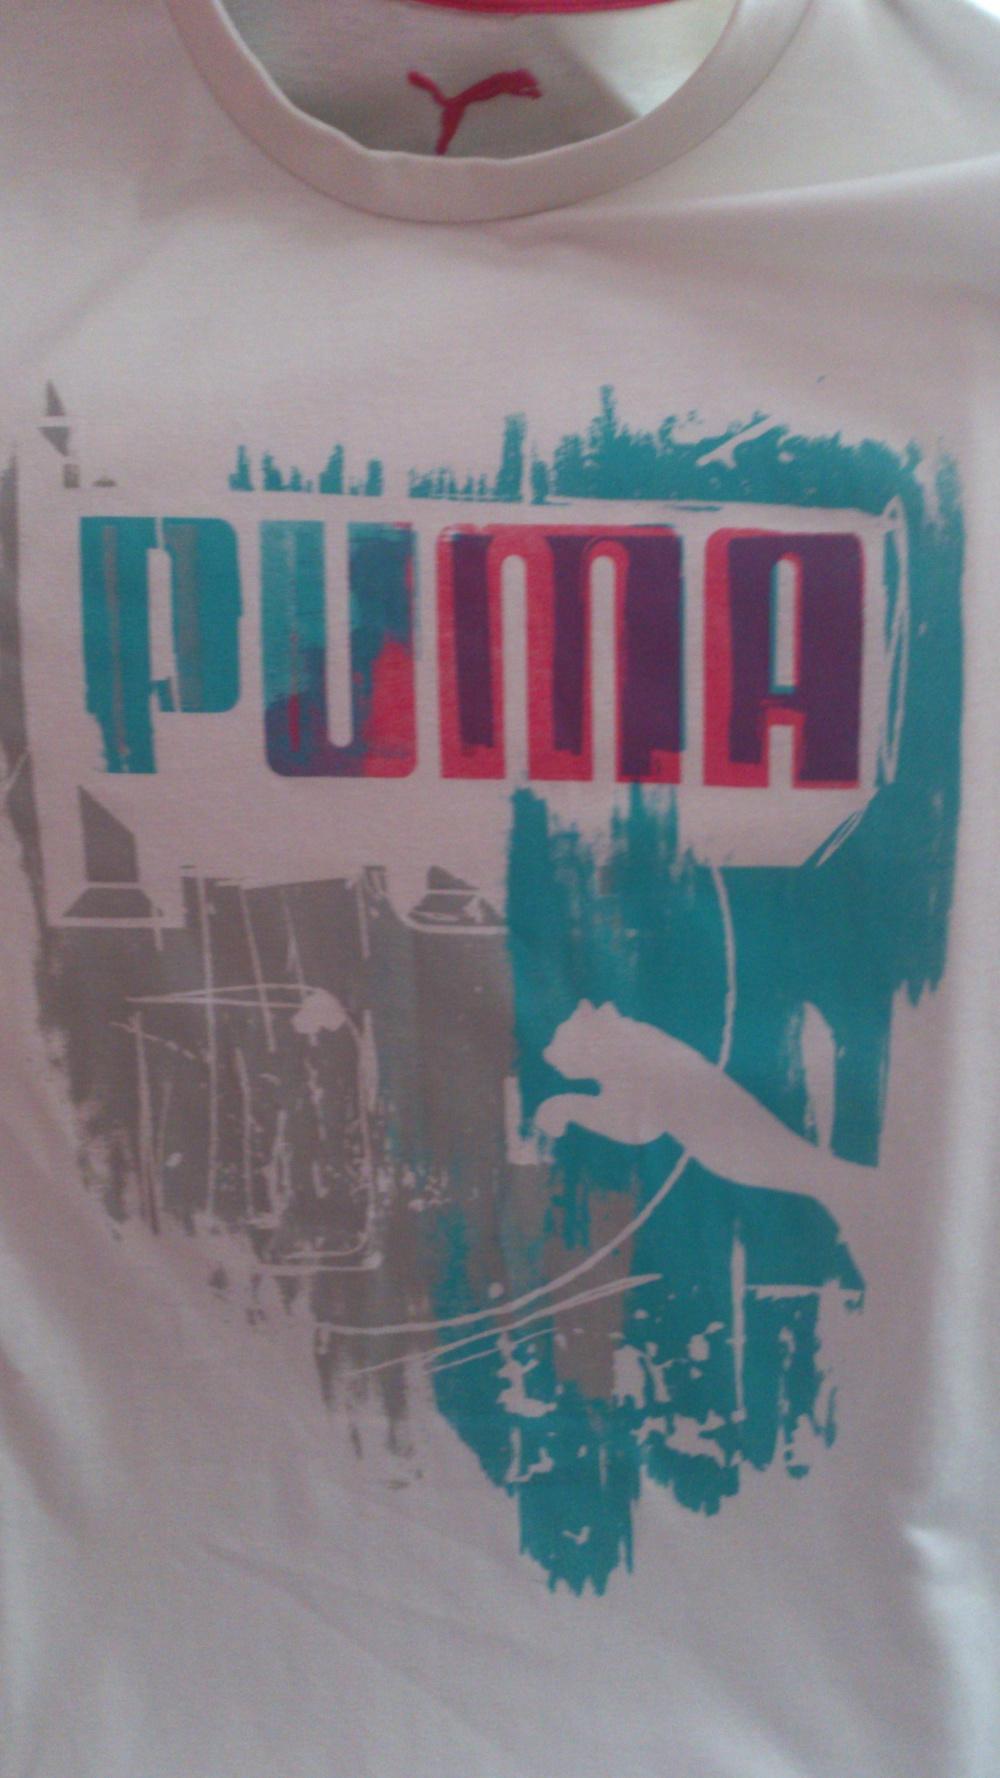 Футболка PUMA, унисекс, размер XXL = 54-56 (рос)